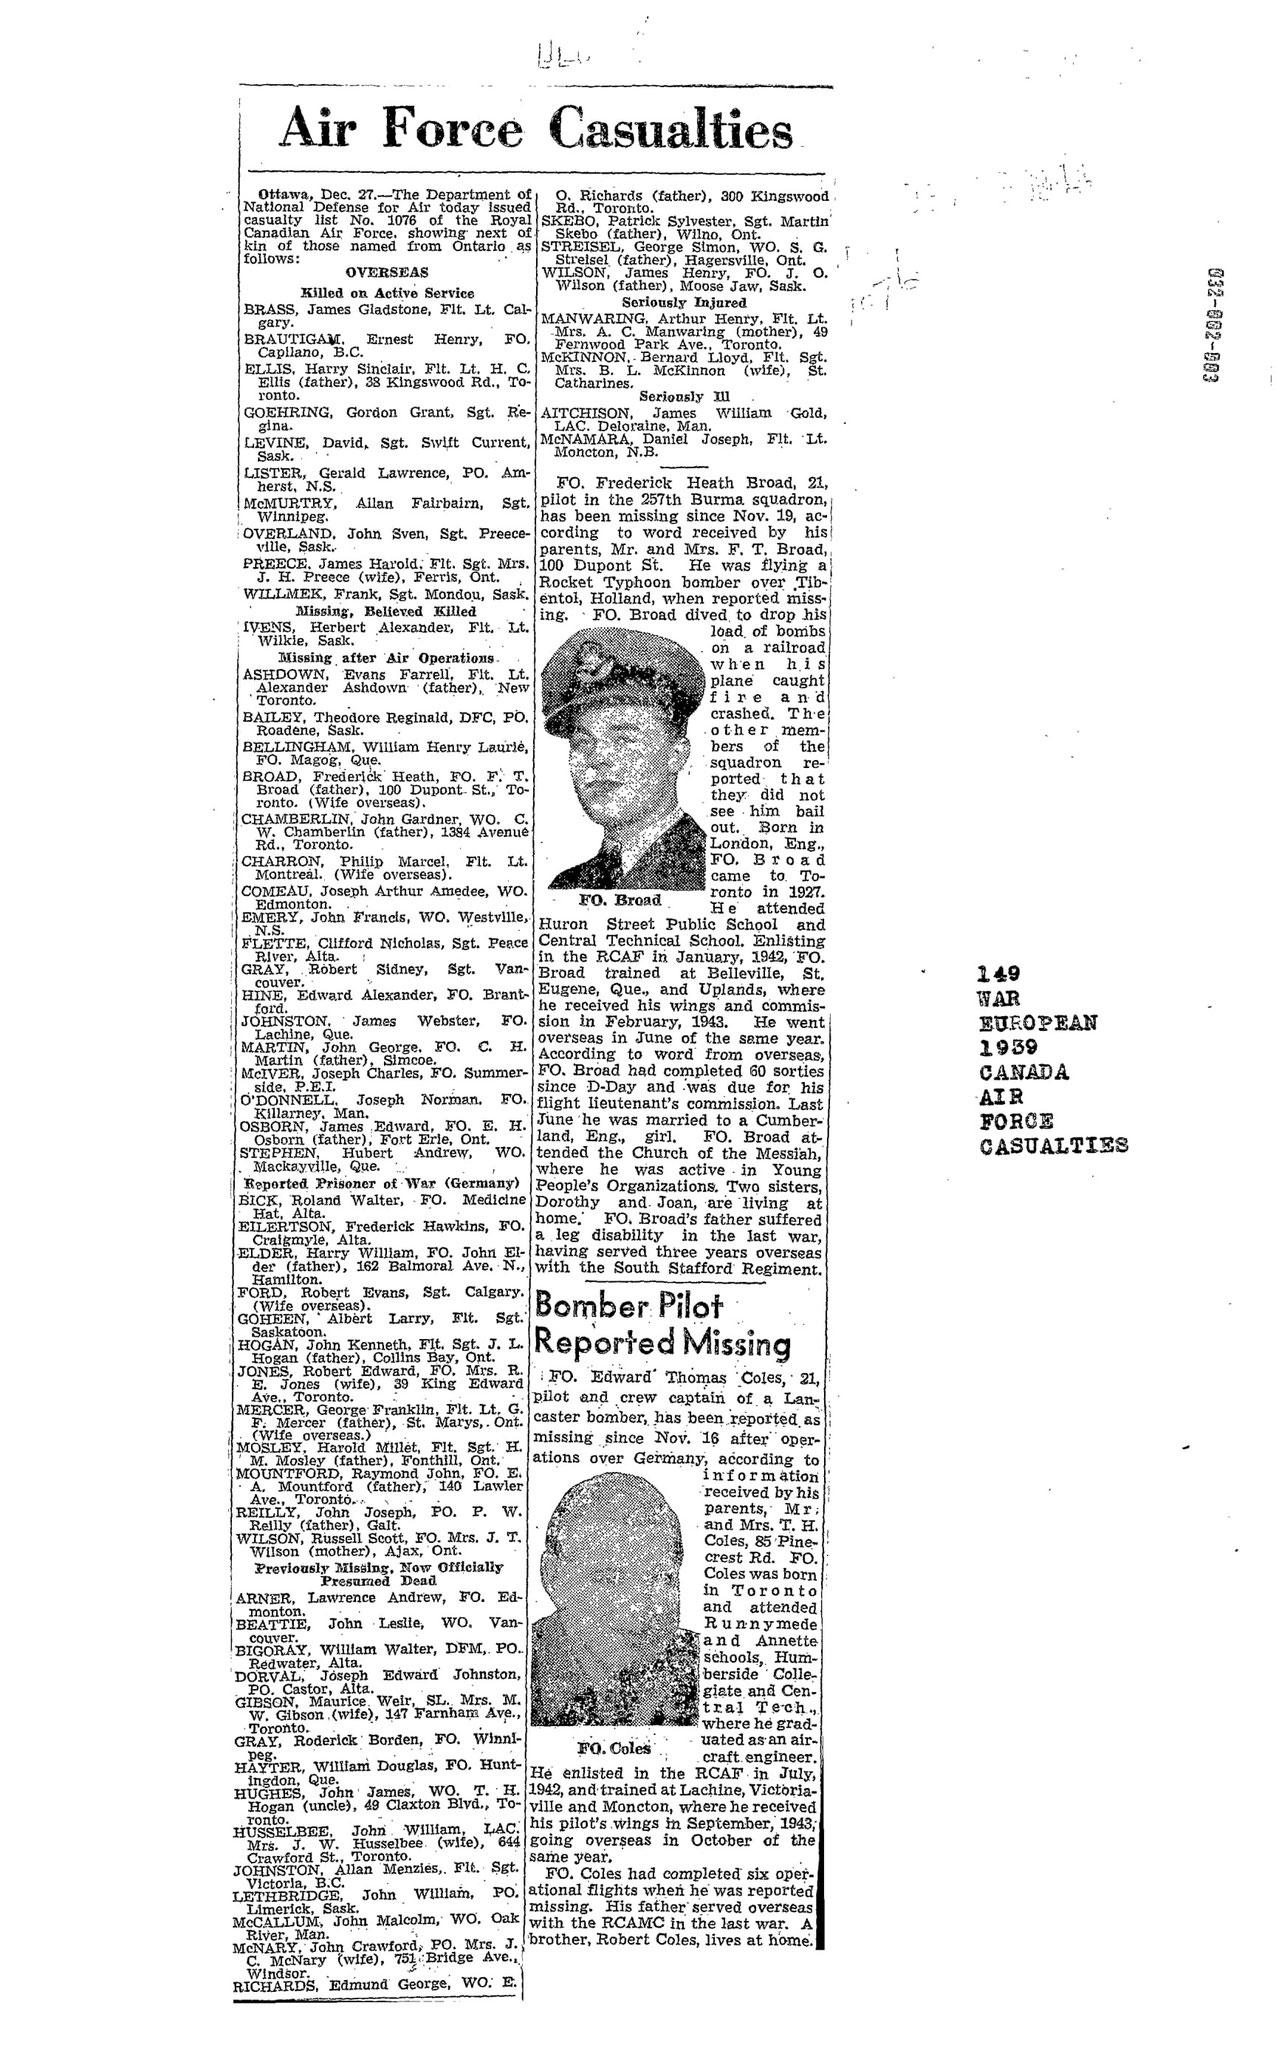 G;lobe and Mail 28-12-1944